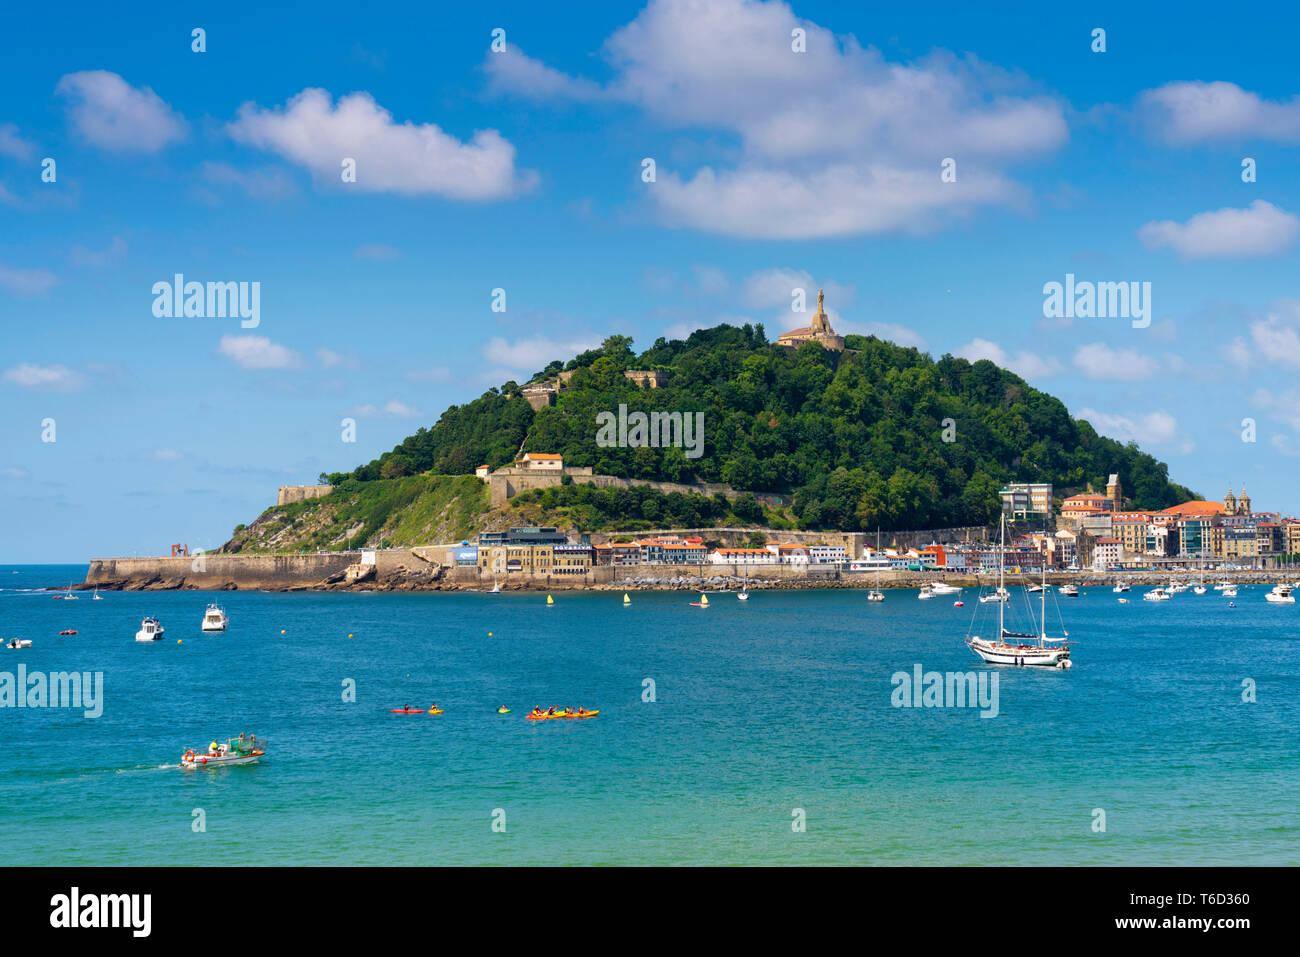 Spain, Basque Country, San Sebastian (Donostia). view of town and Concha bay - Stock Image